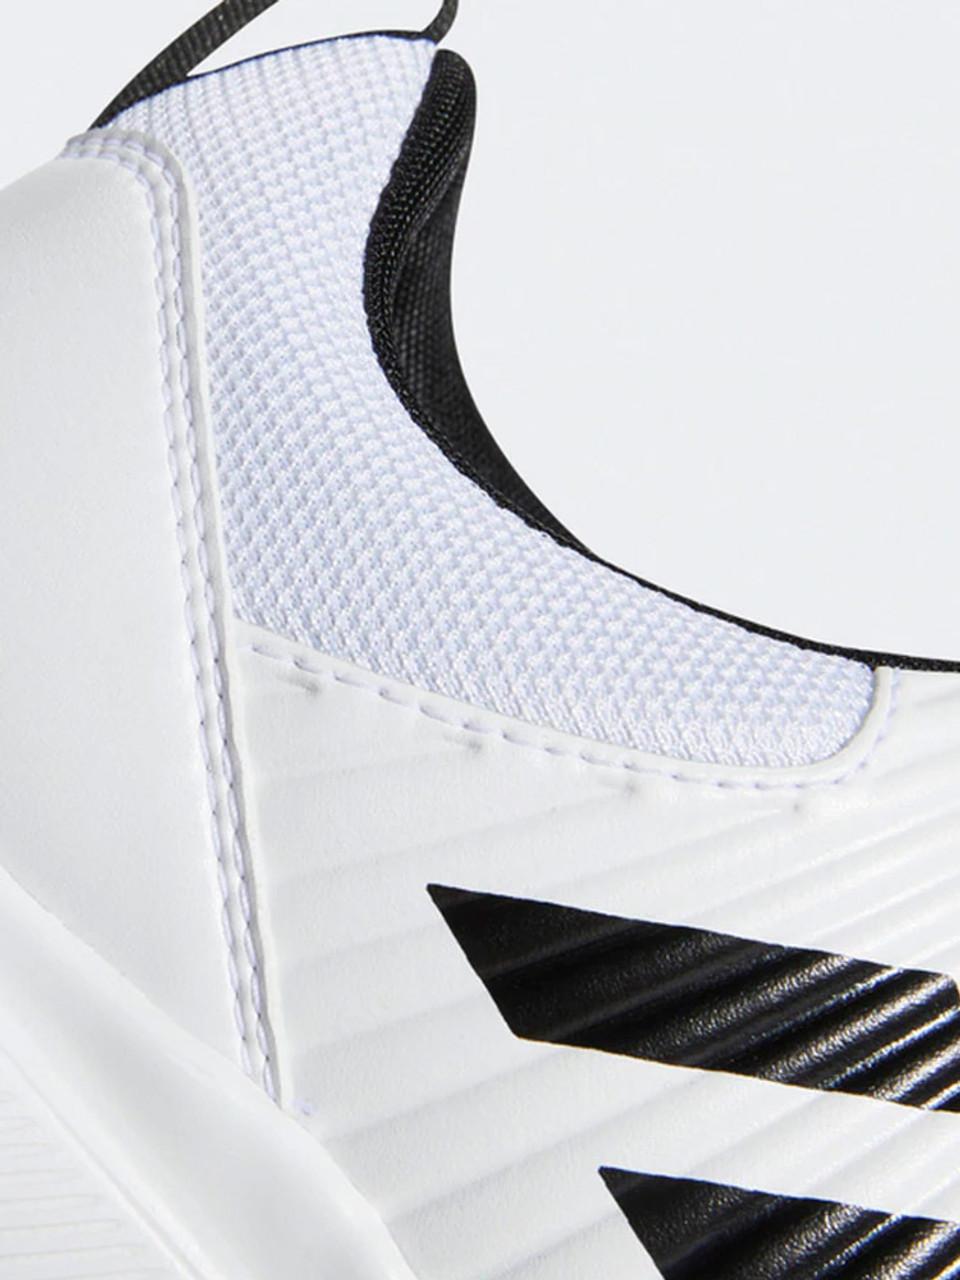 eab3ef06140 Adidas CP Traxion SL Golf Shoes - FTWR White Core Black - Mens For ...